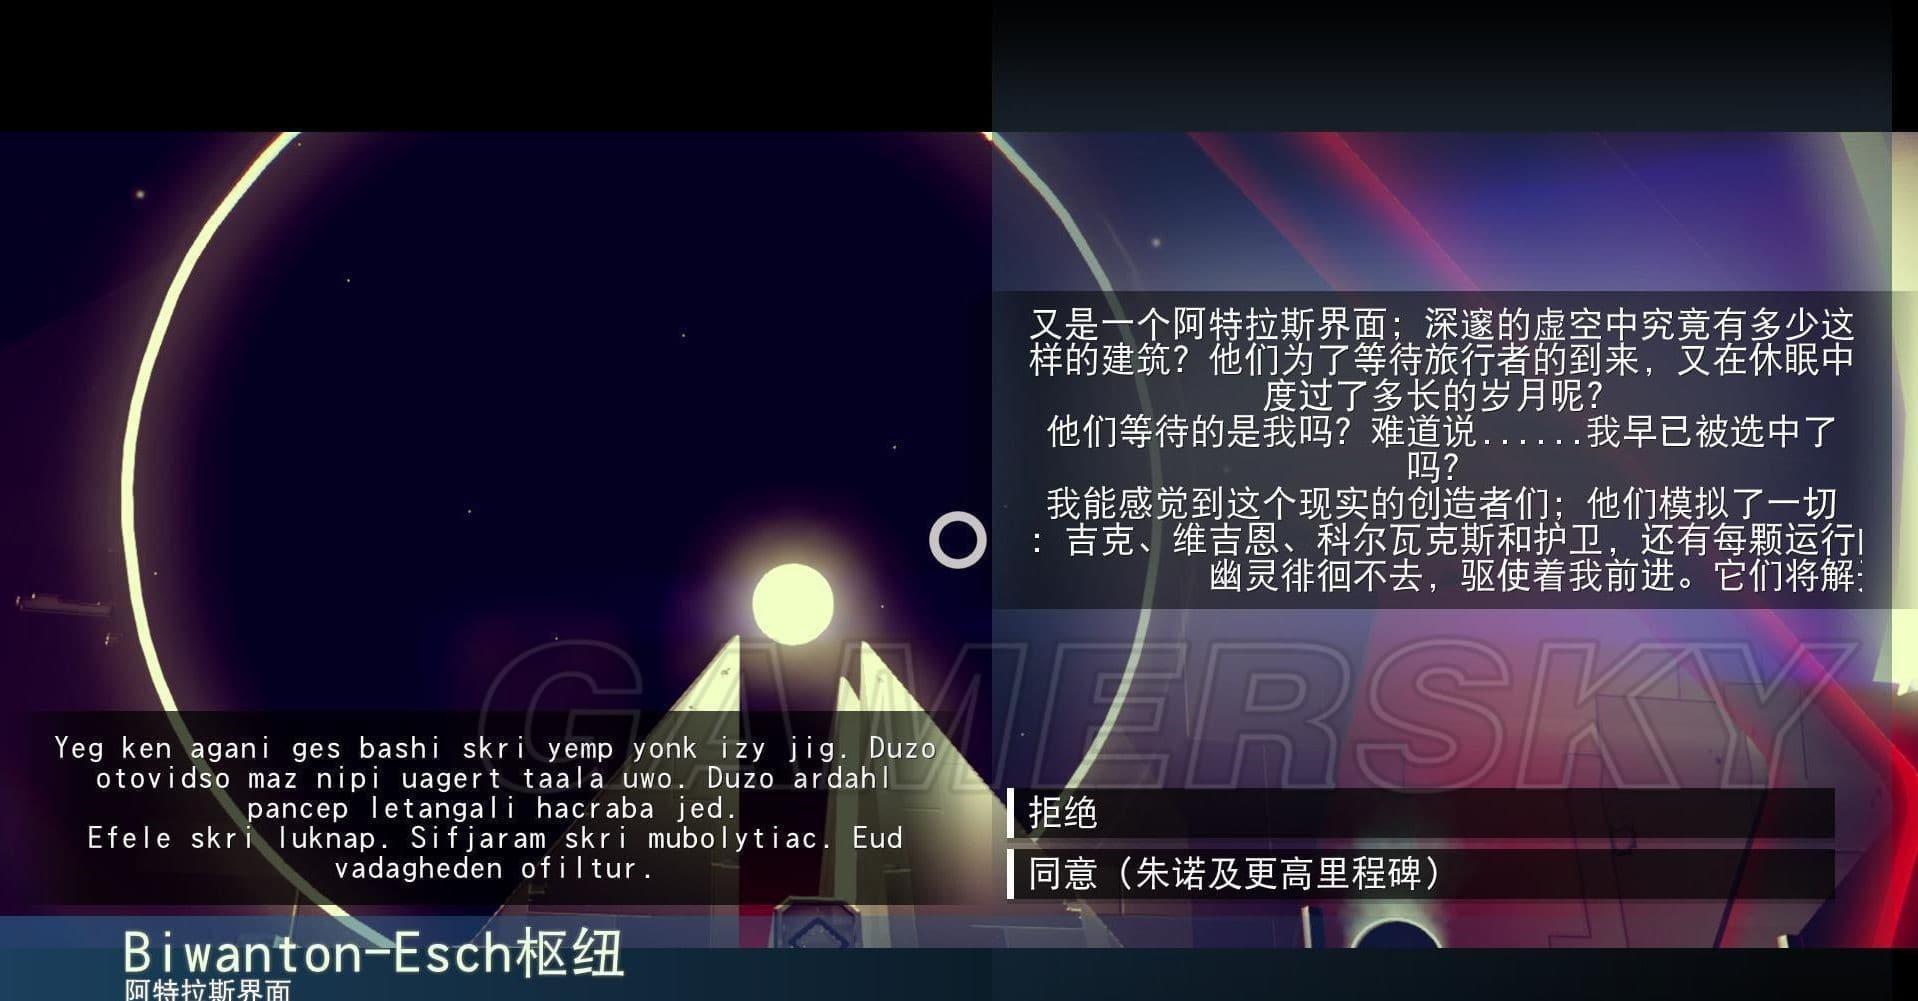 No Man's Sky 圖文攻略 全系統分析及新手圖文攻略